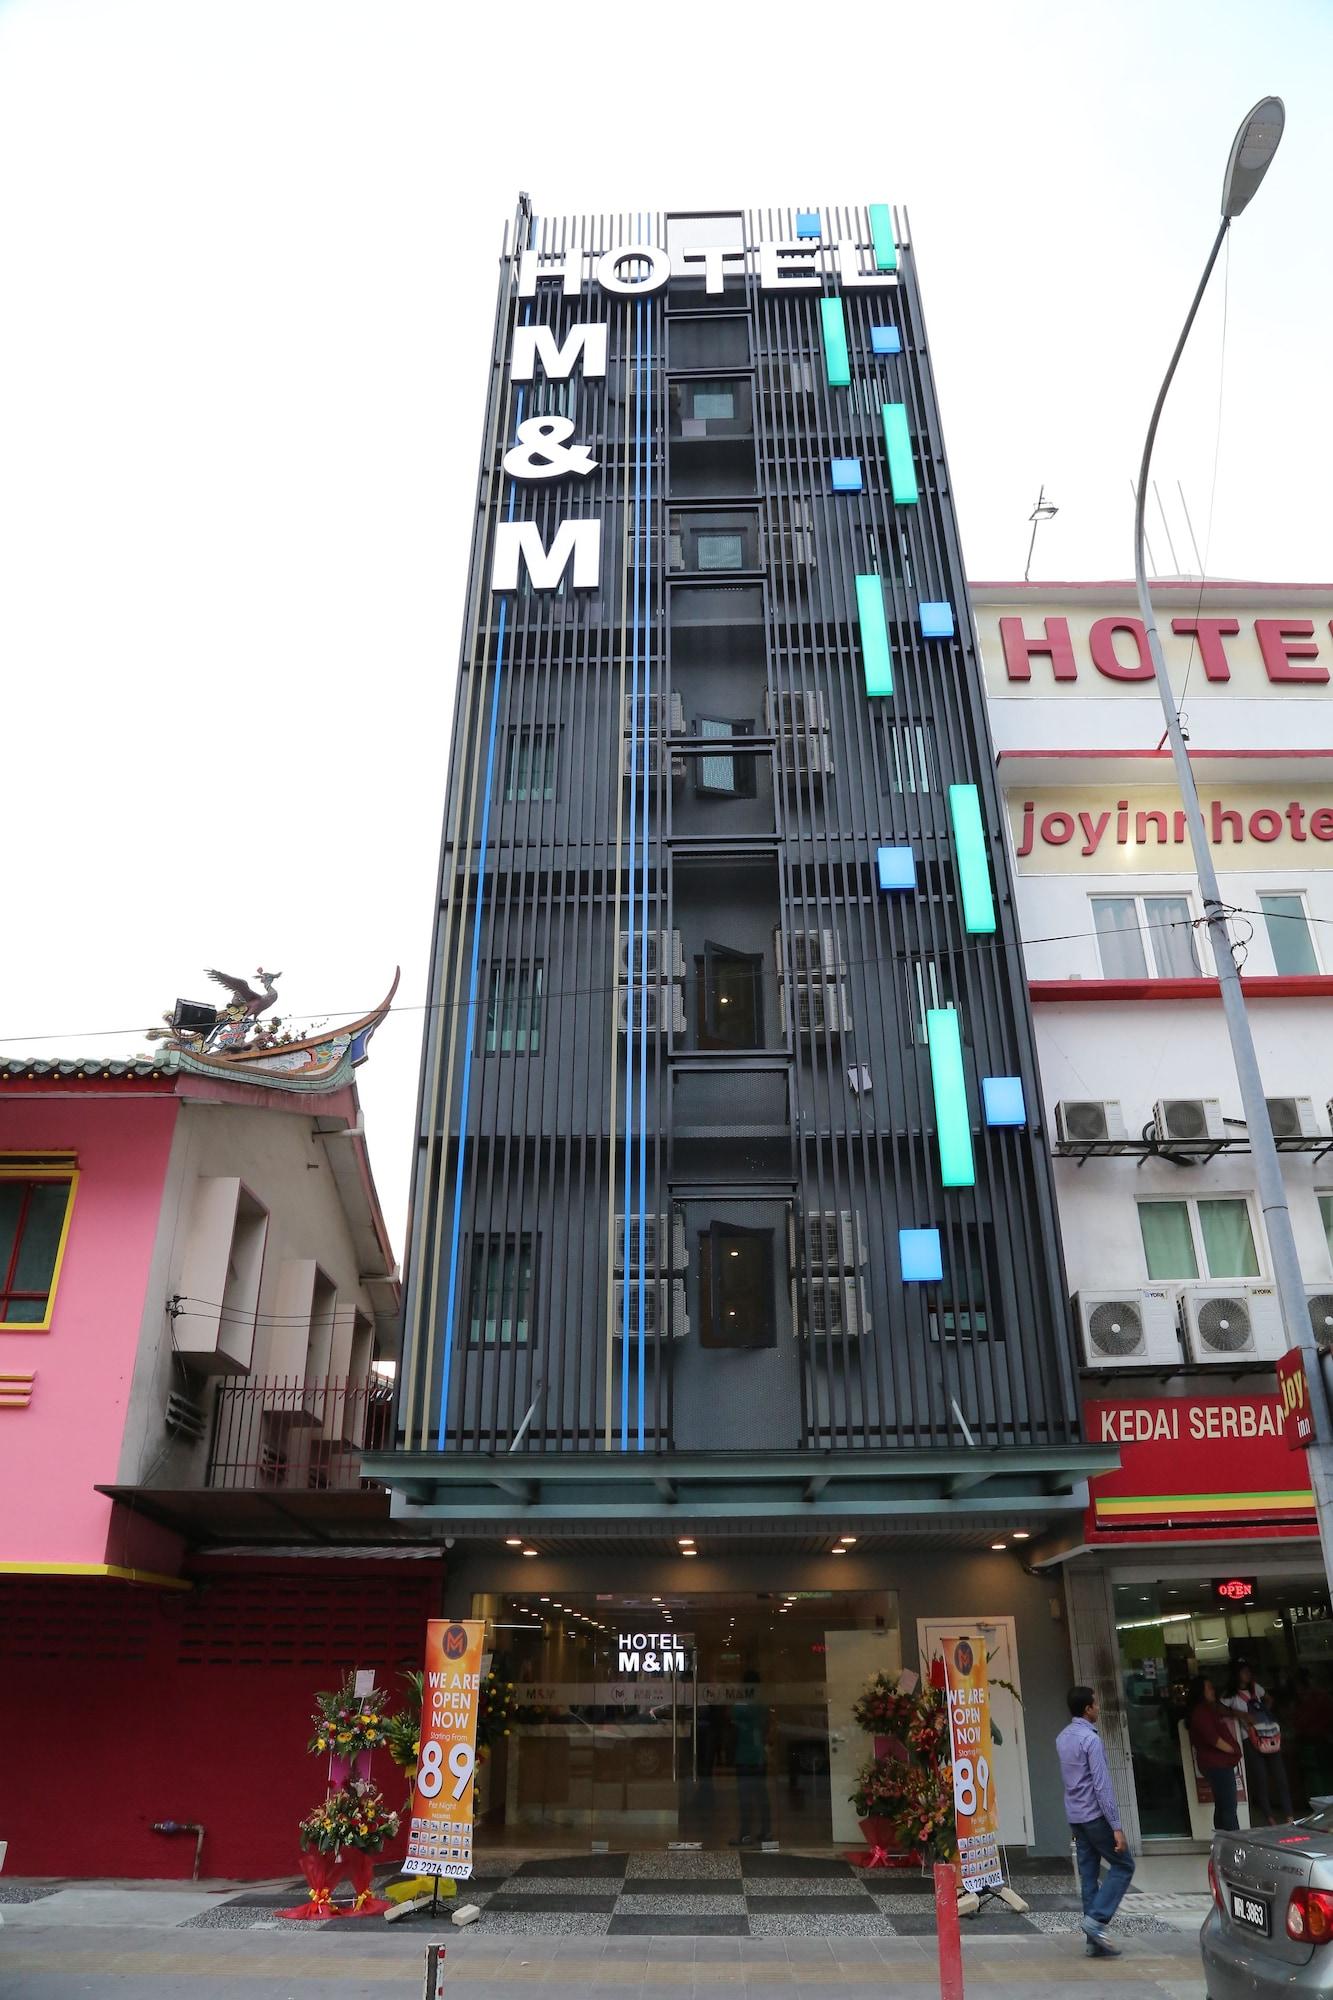 Double M Hotel @ KL Sentral, Kuala Lumpur